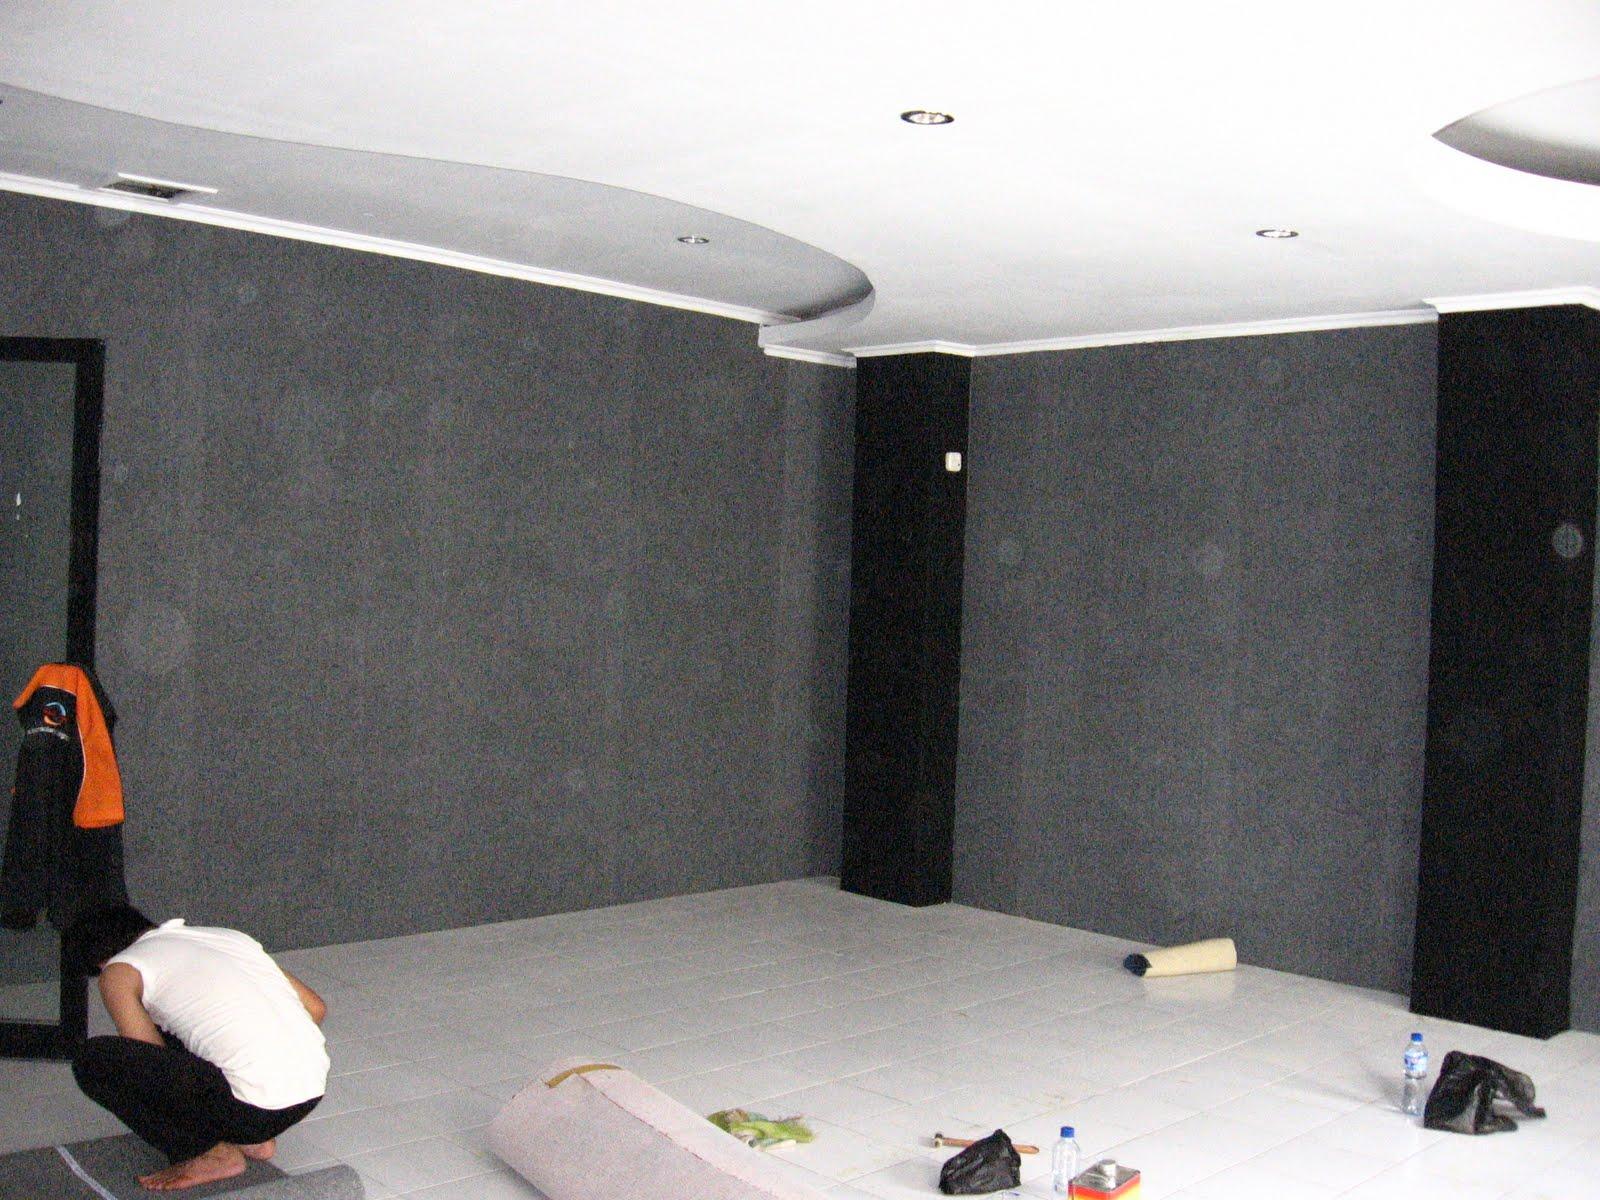 Sofa Studio Musik Bandung West Elm Hamilton Leather Reviews Harmony Carpet Instalasi Karpet